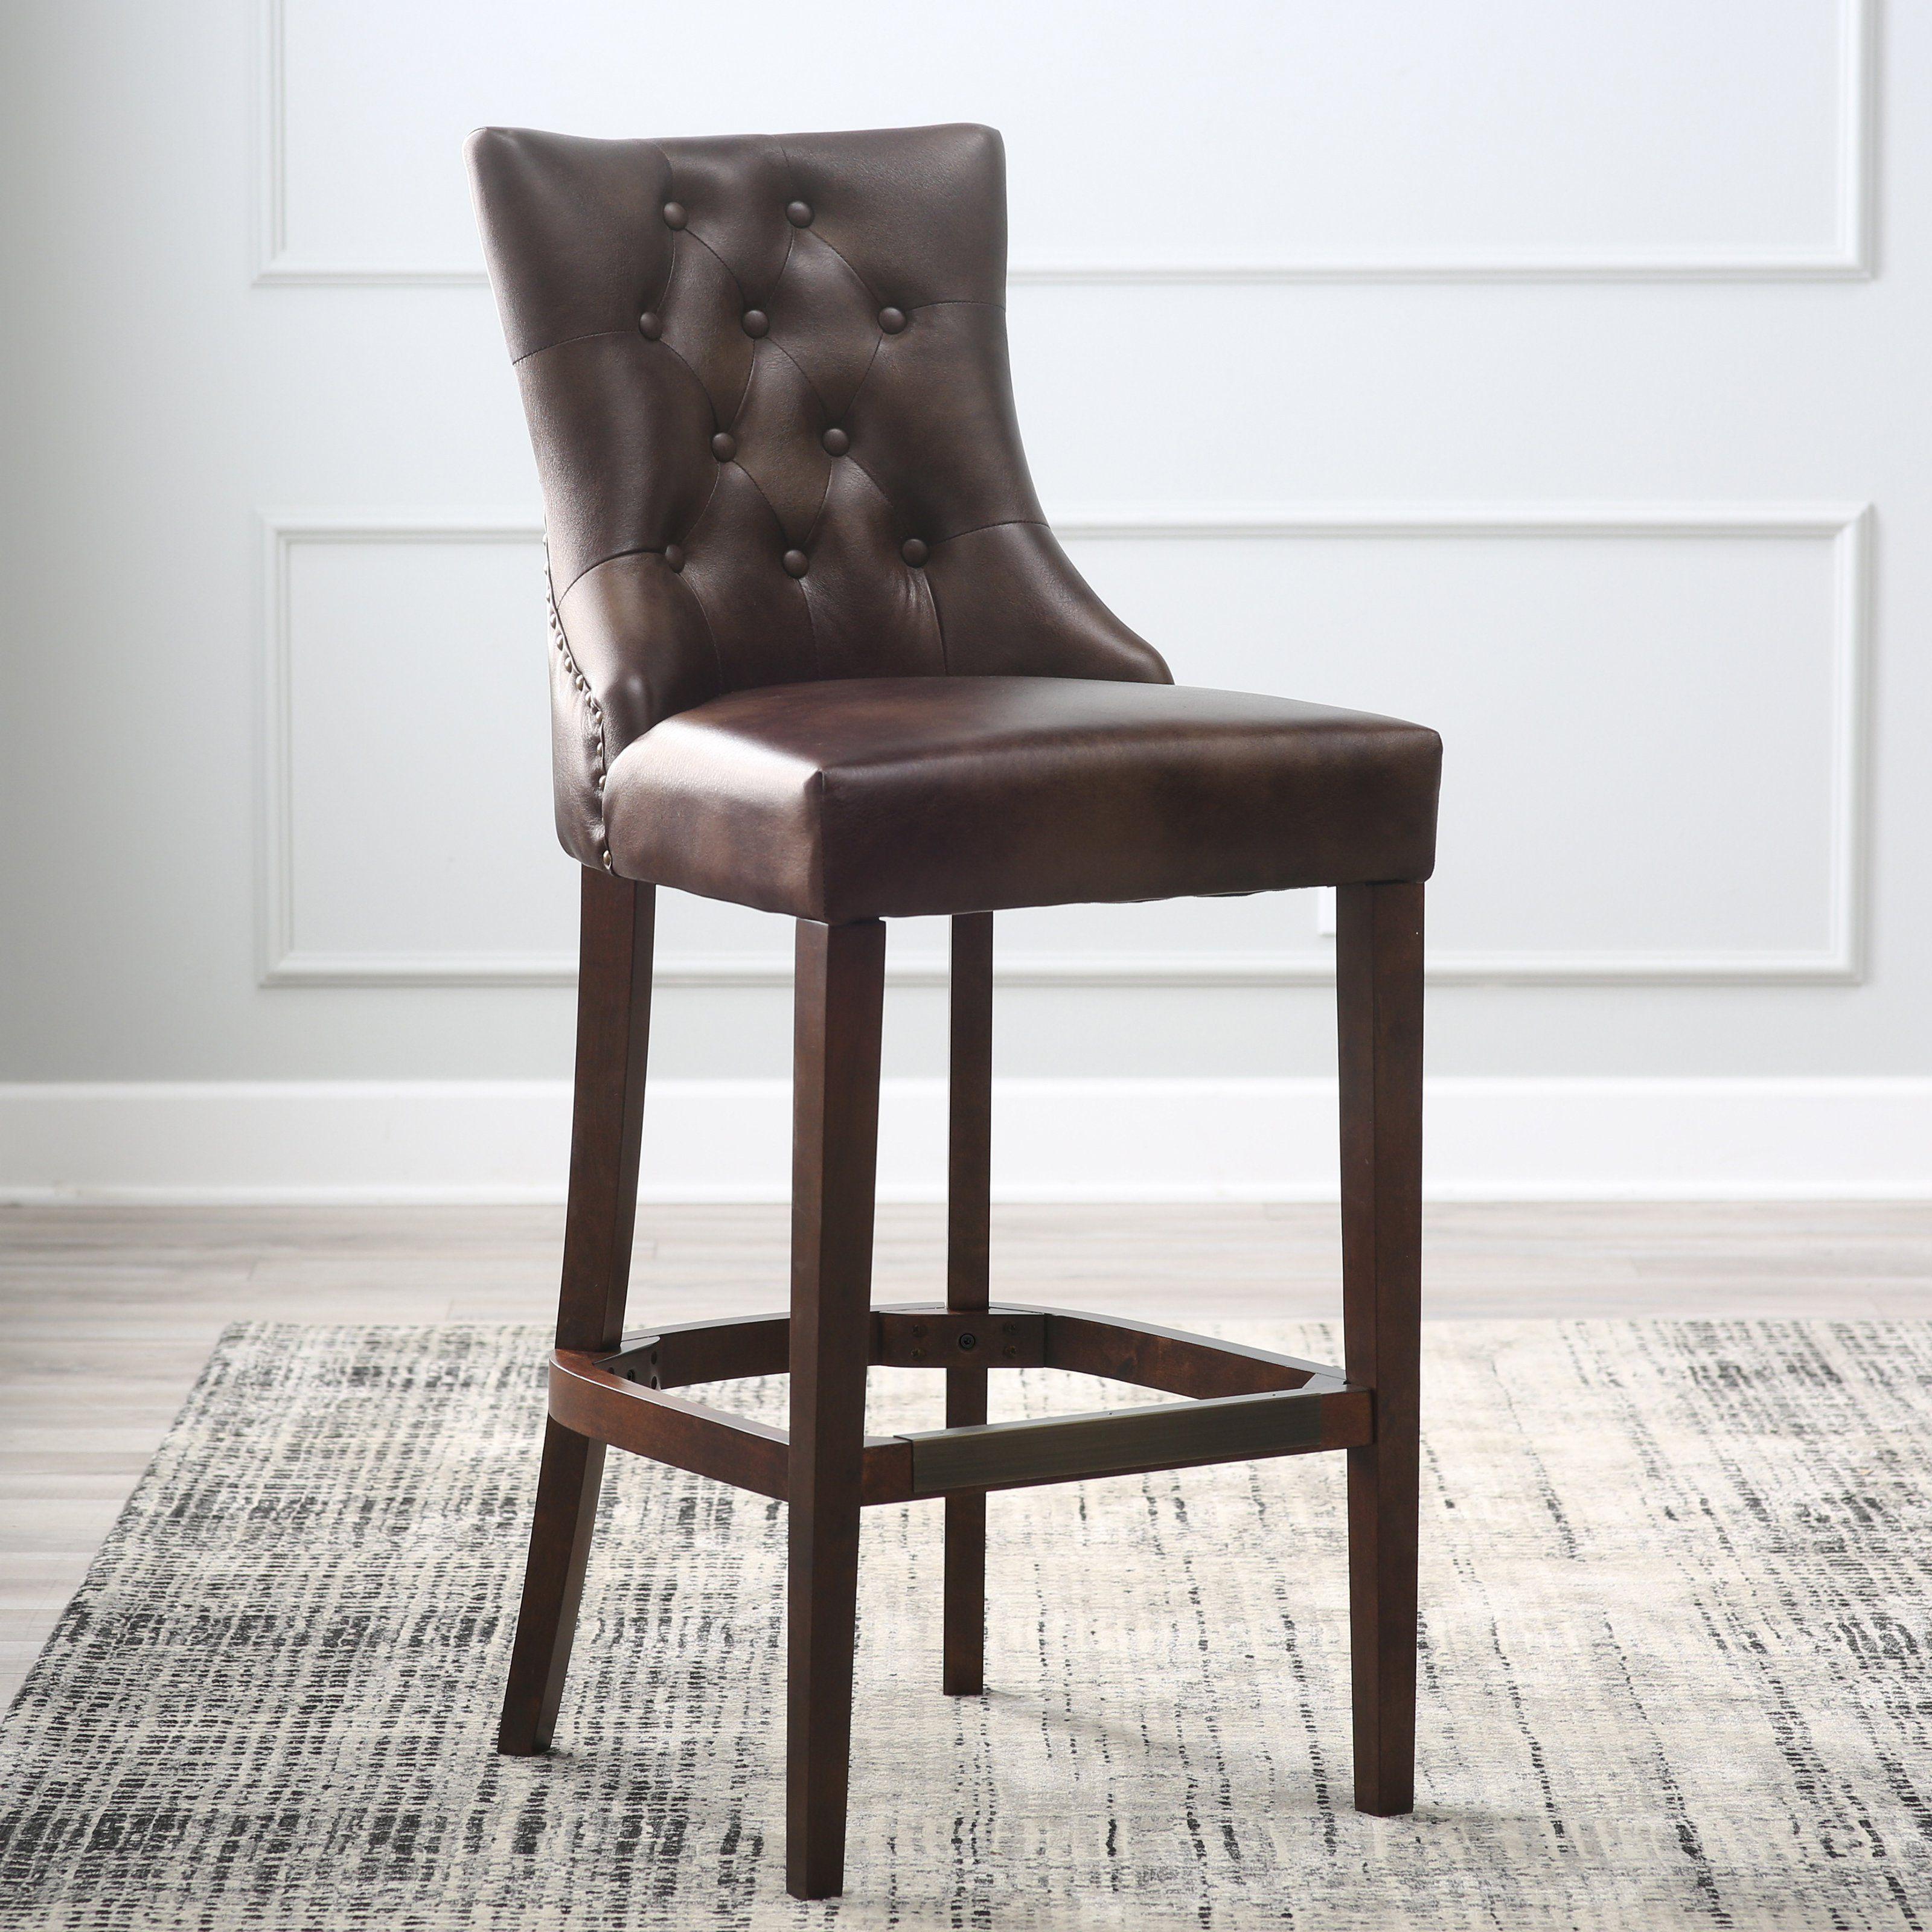 Belham living thomas bonded leather tufted bar stool from hayneedle com